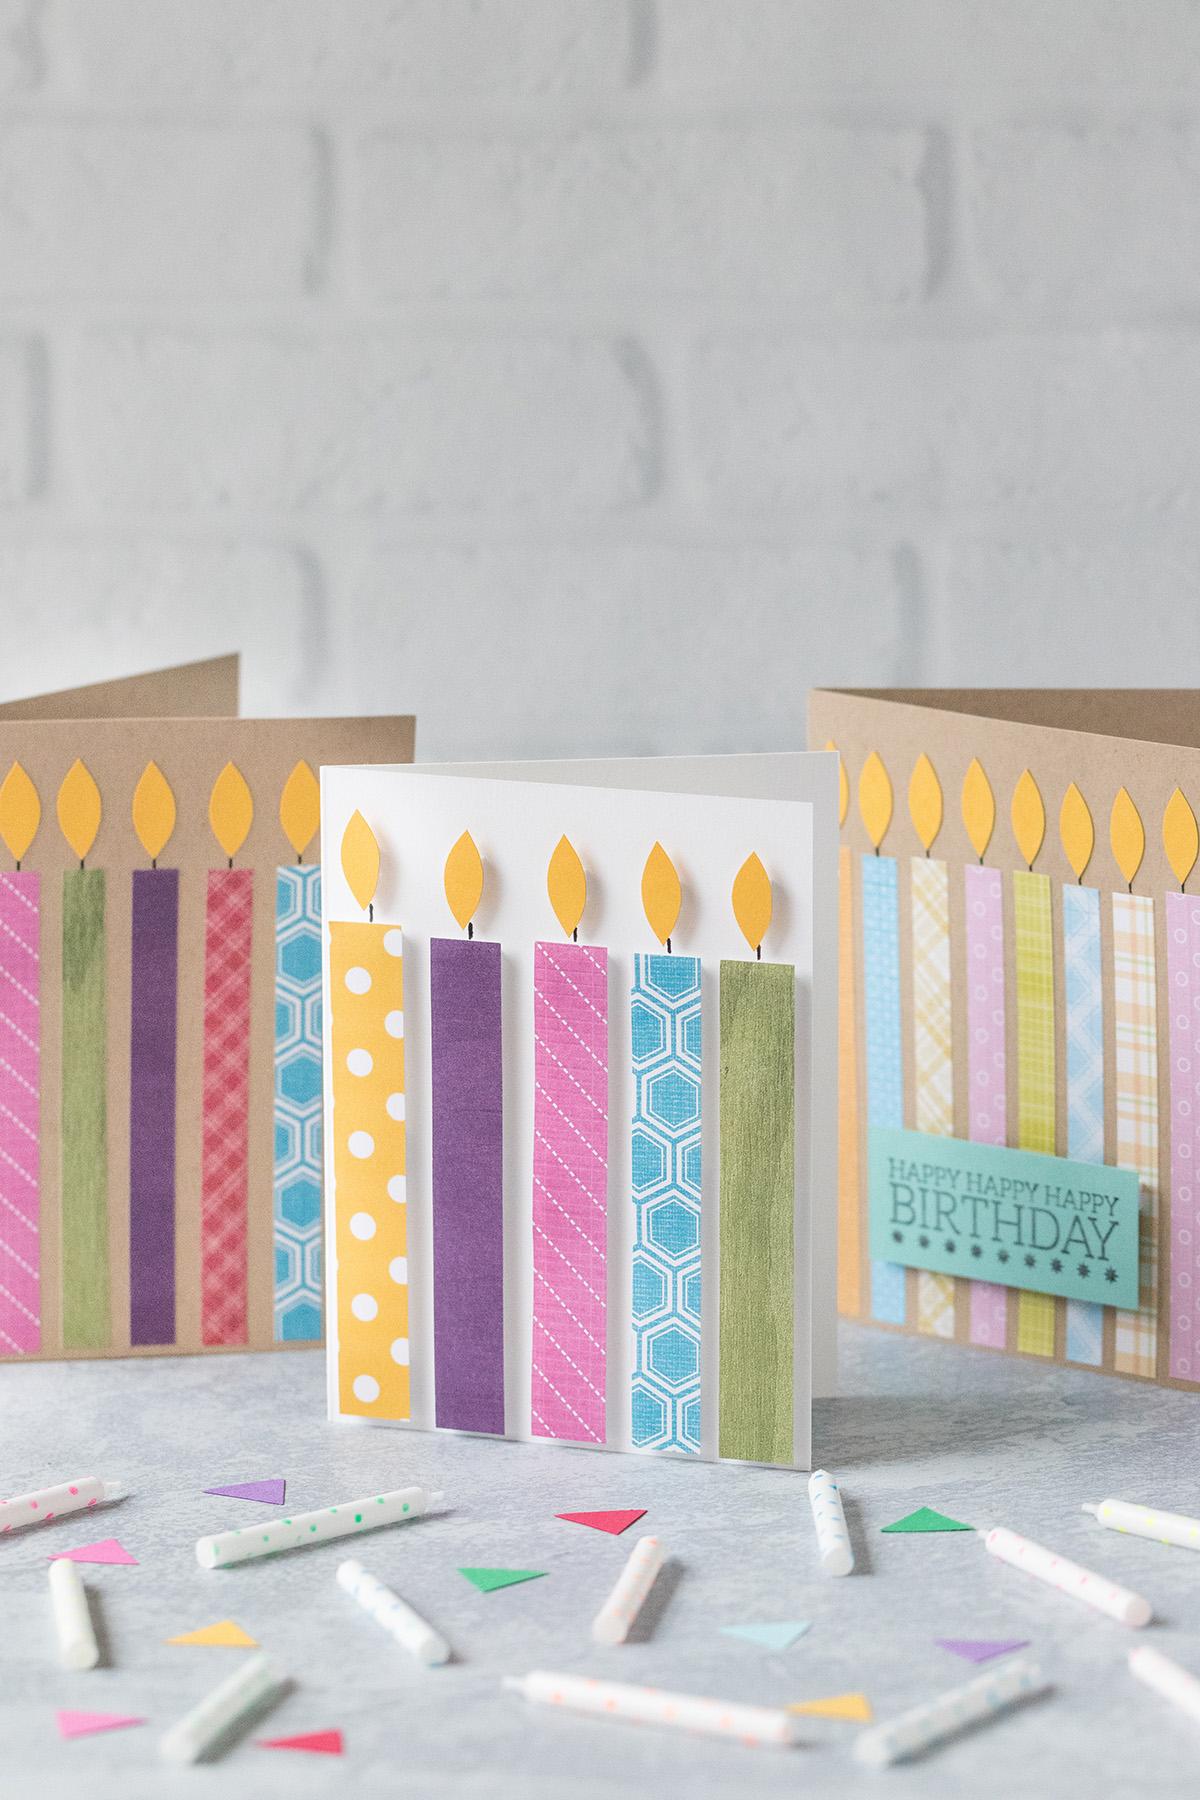 DIY Easy Candle Birthday Cards